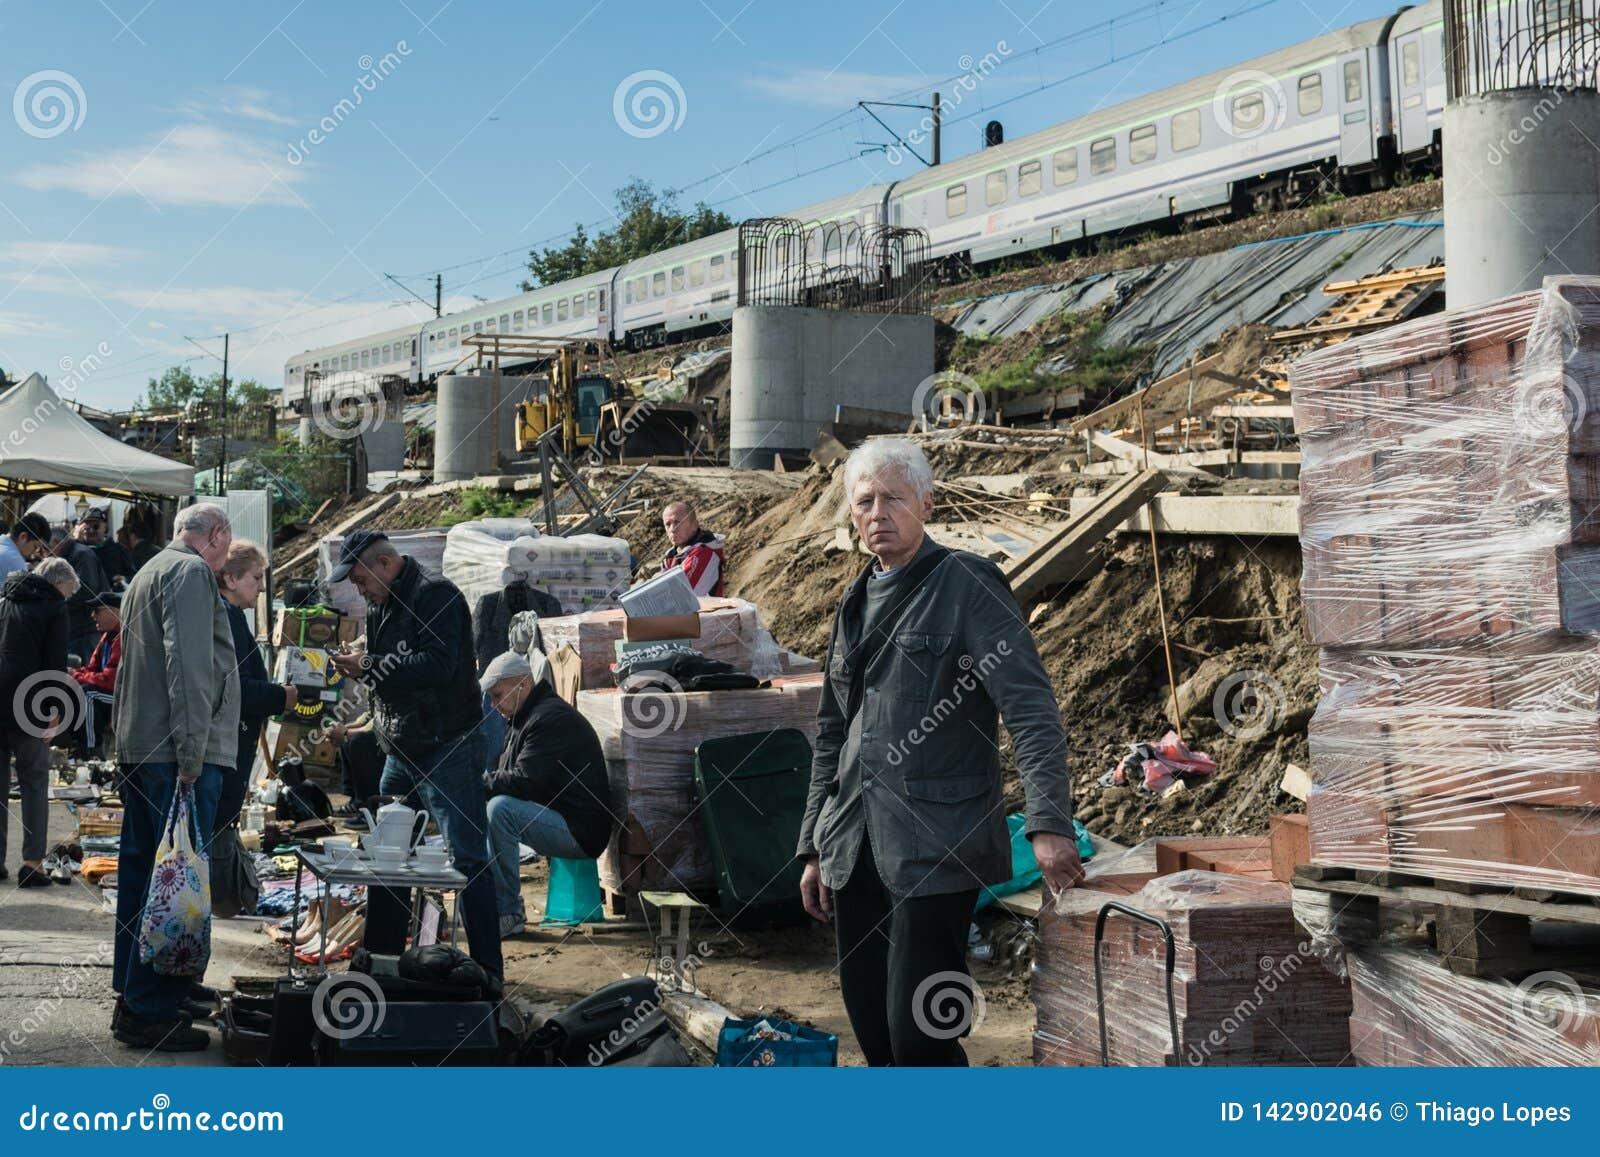 Krakow, Poland - September 21, 2019: Sellers negotiate their goods at the street flea market near the train line in